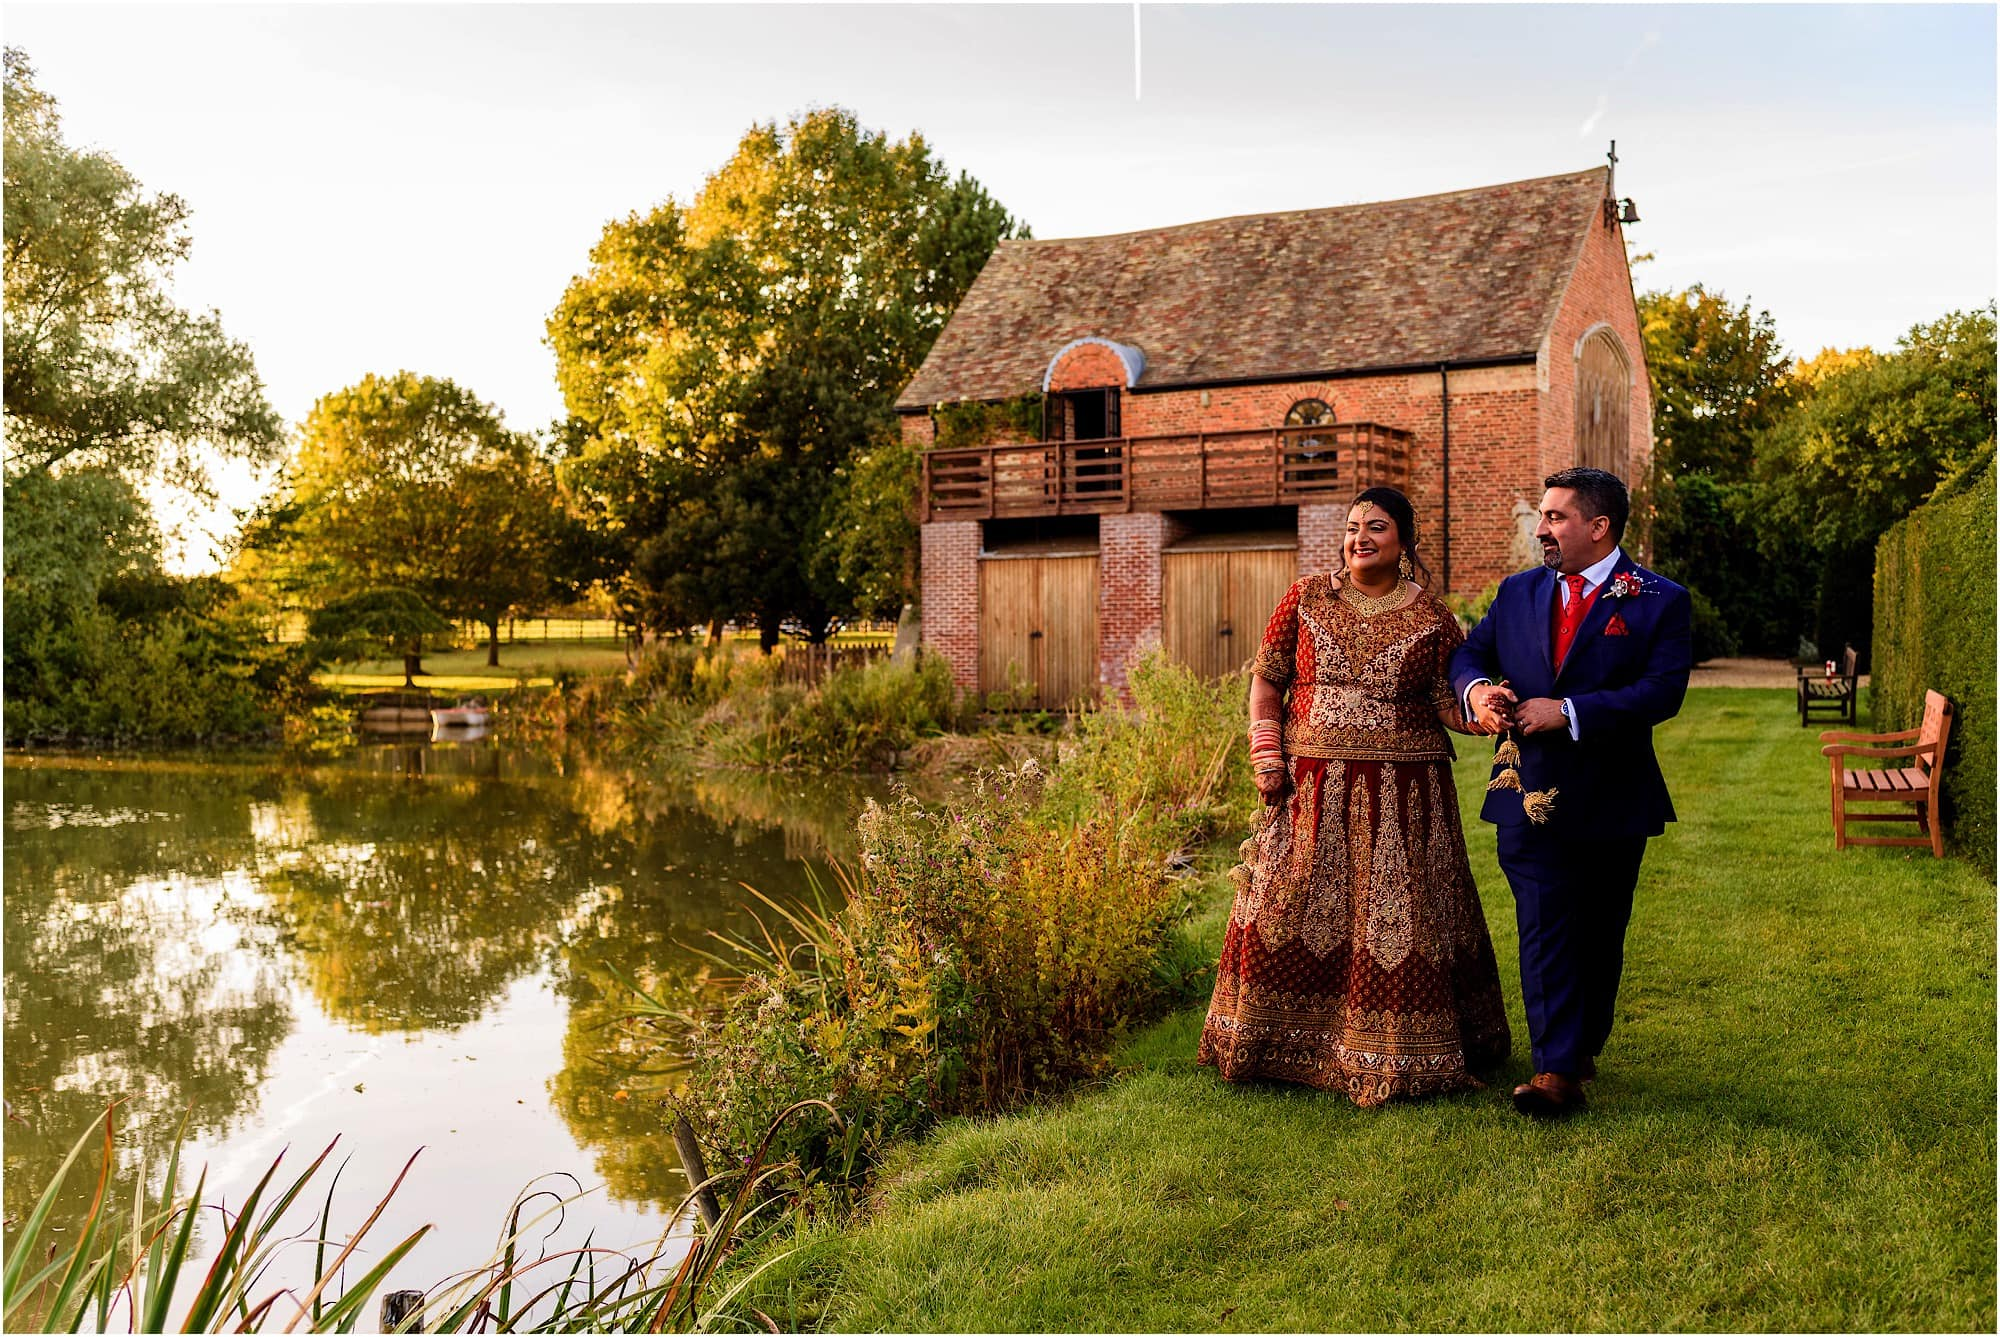 Natural wedding photographer at Childerley Hall Long Barn